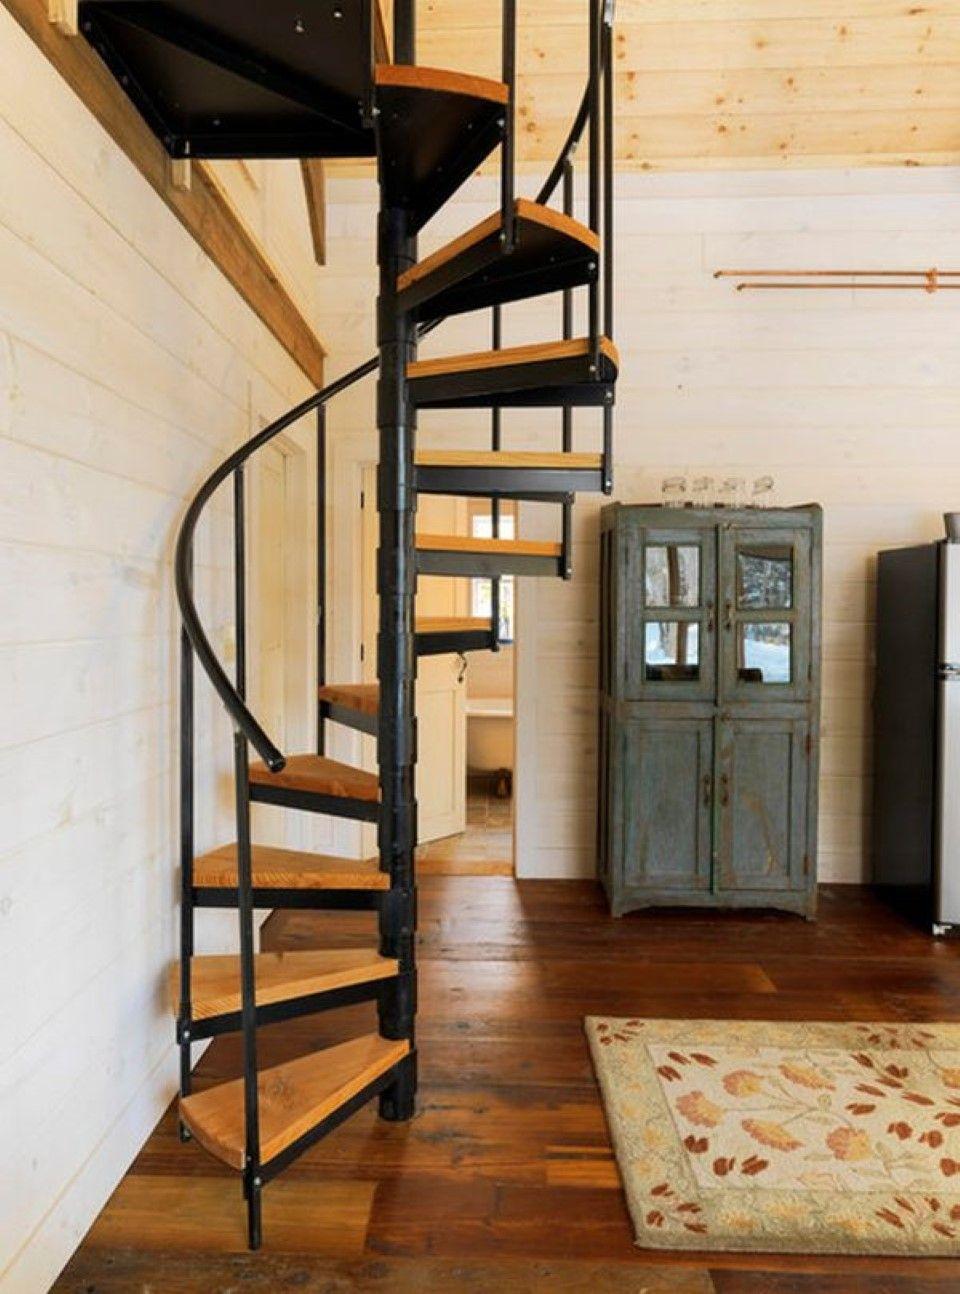 Staircase modern constructions types design for Circular staircase design